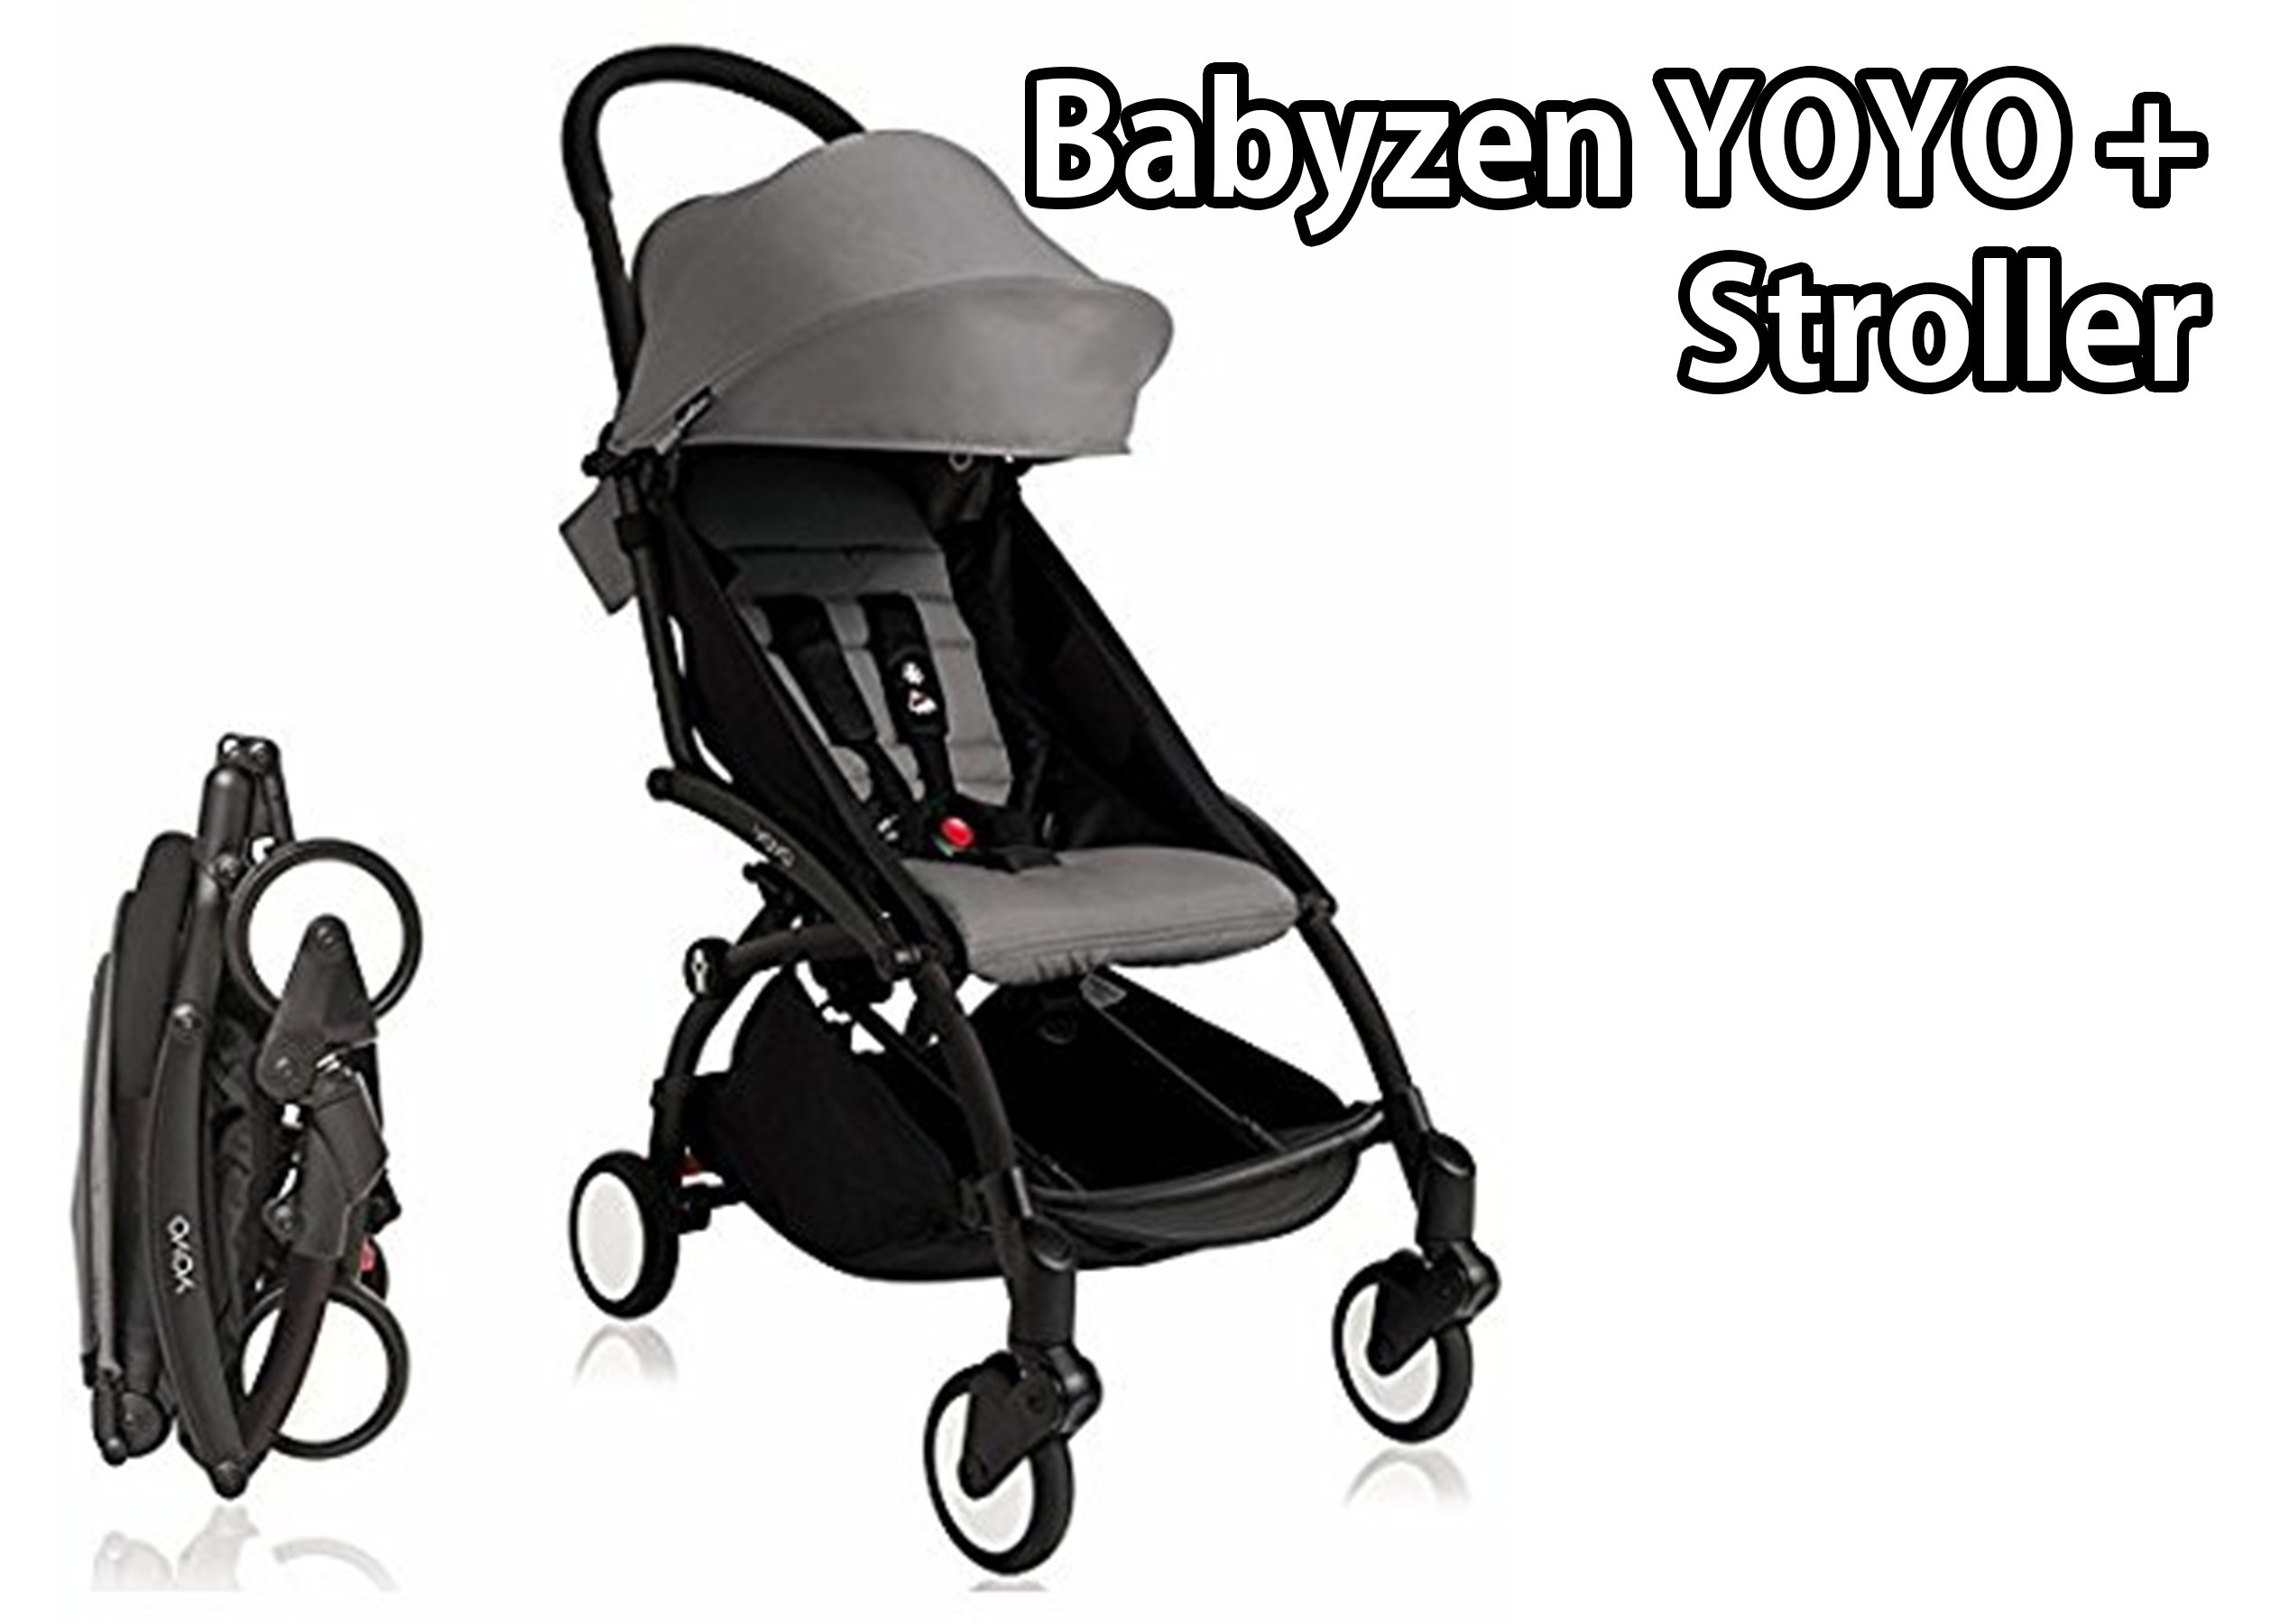 Babyzen YOYO+ Stroller - Black – Grey - The Baby Choice